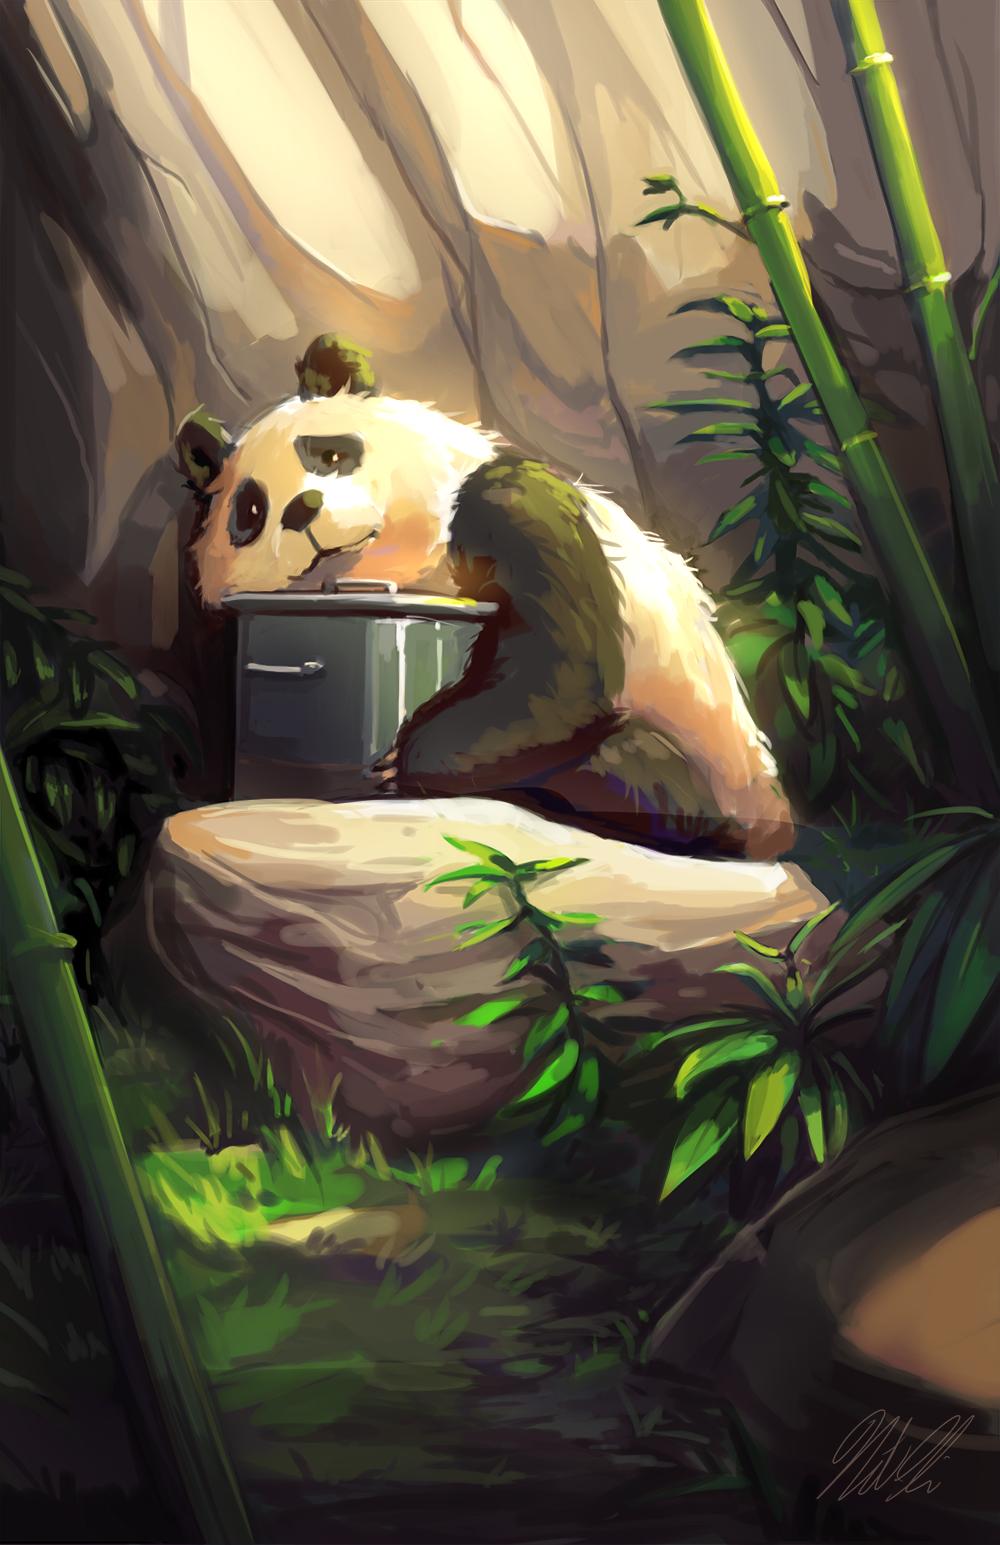 Sad Panda by Limited-Access